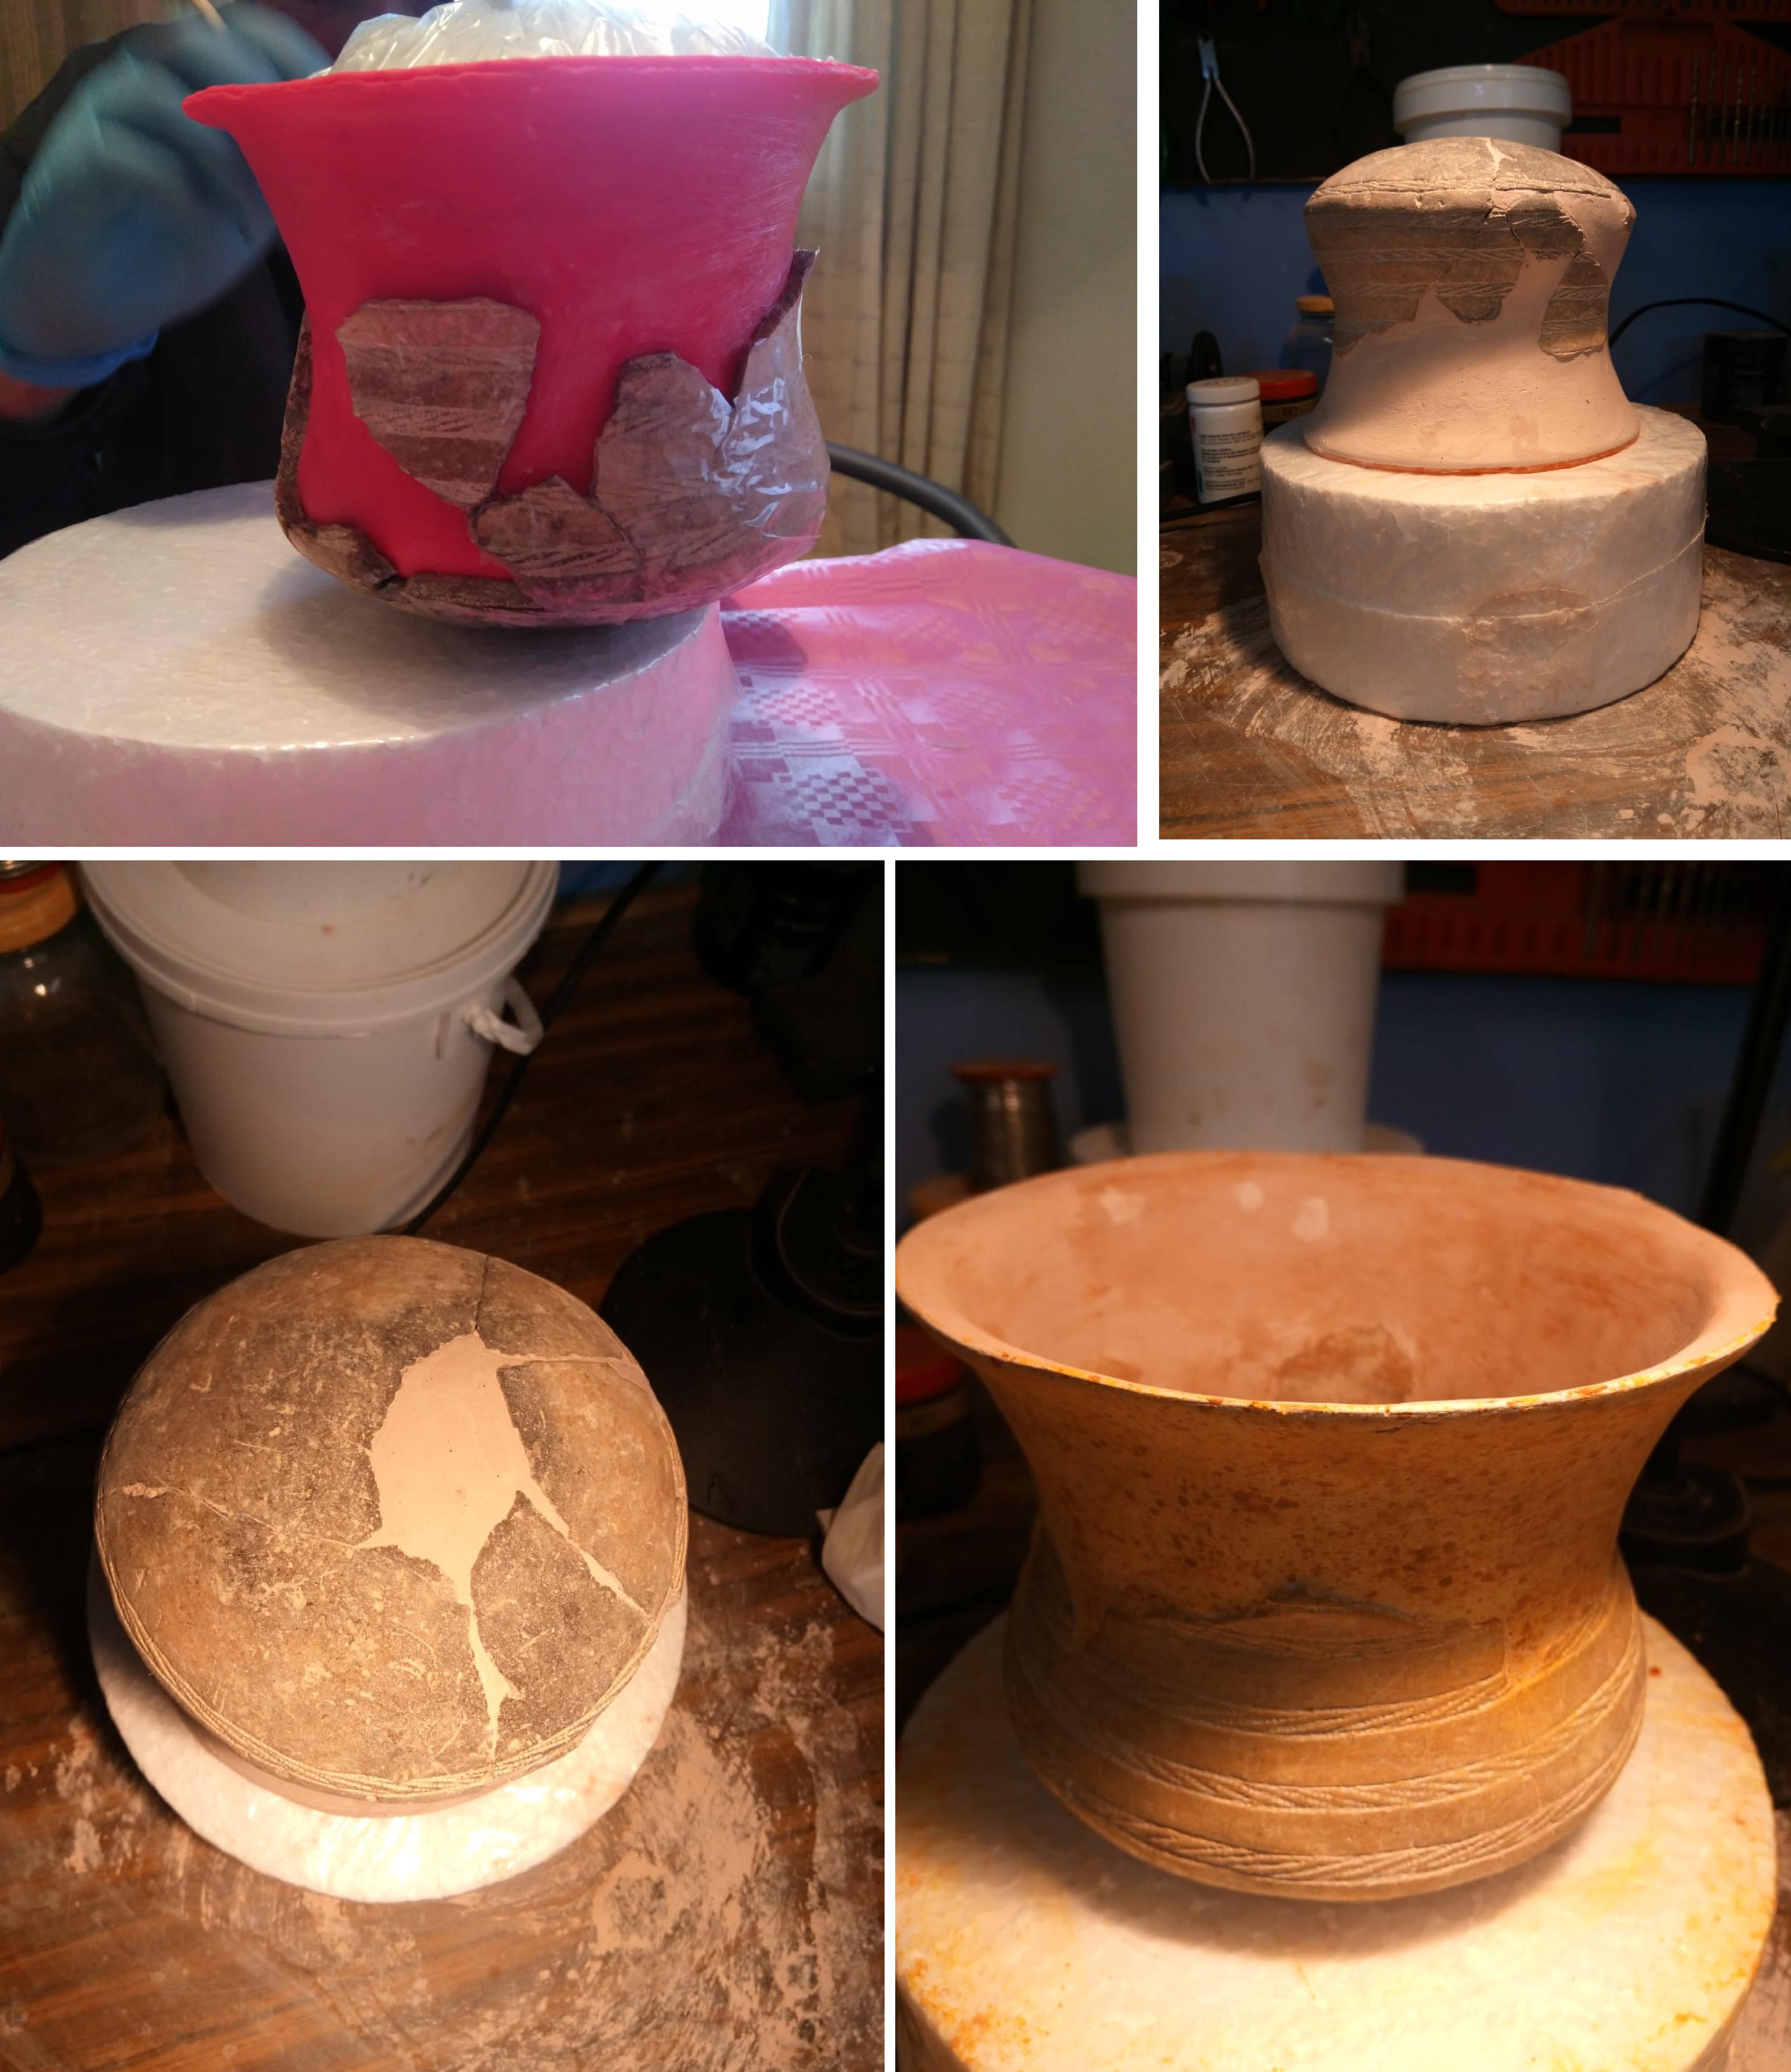 restauración materiales arqueologicos